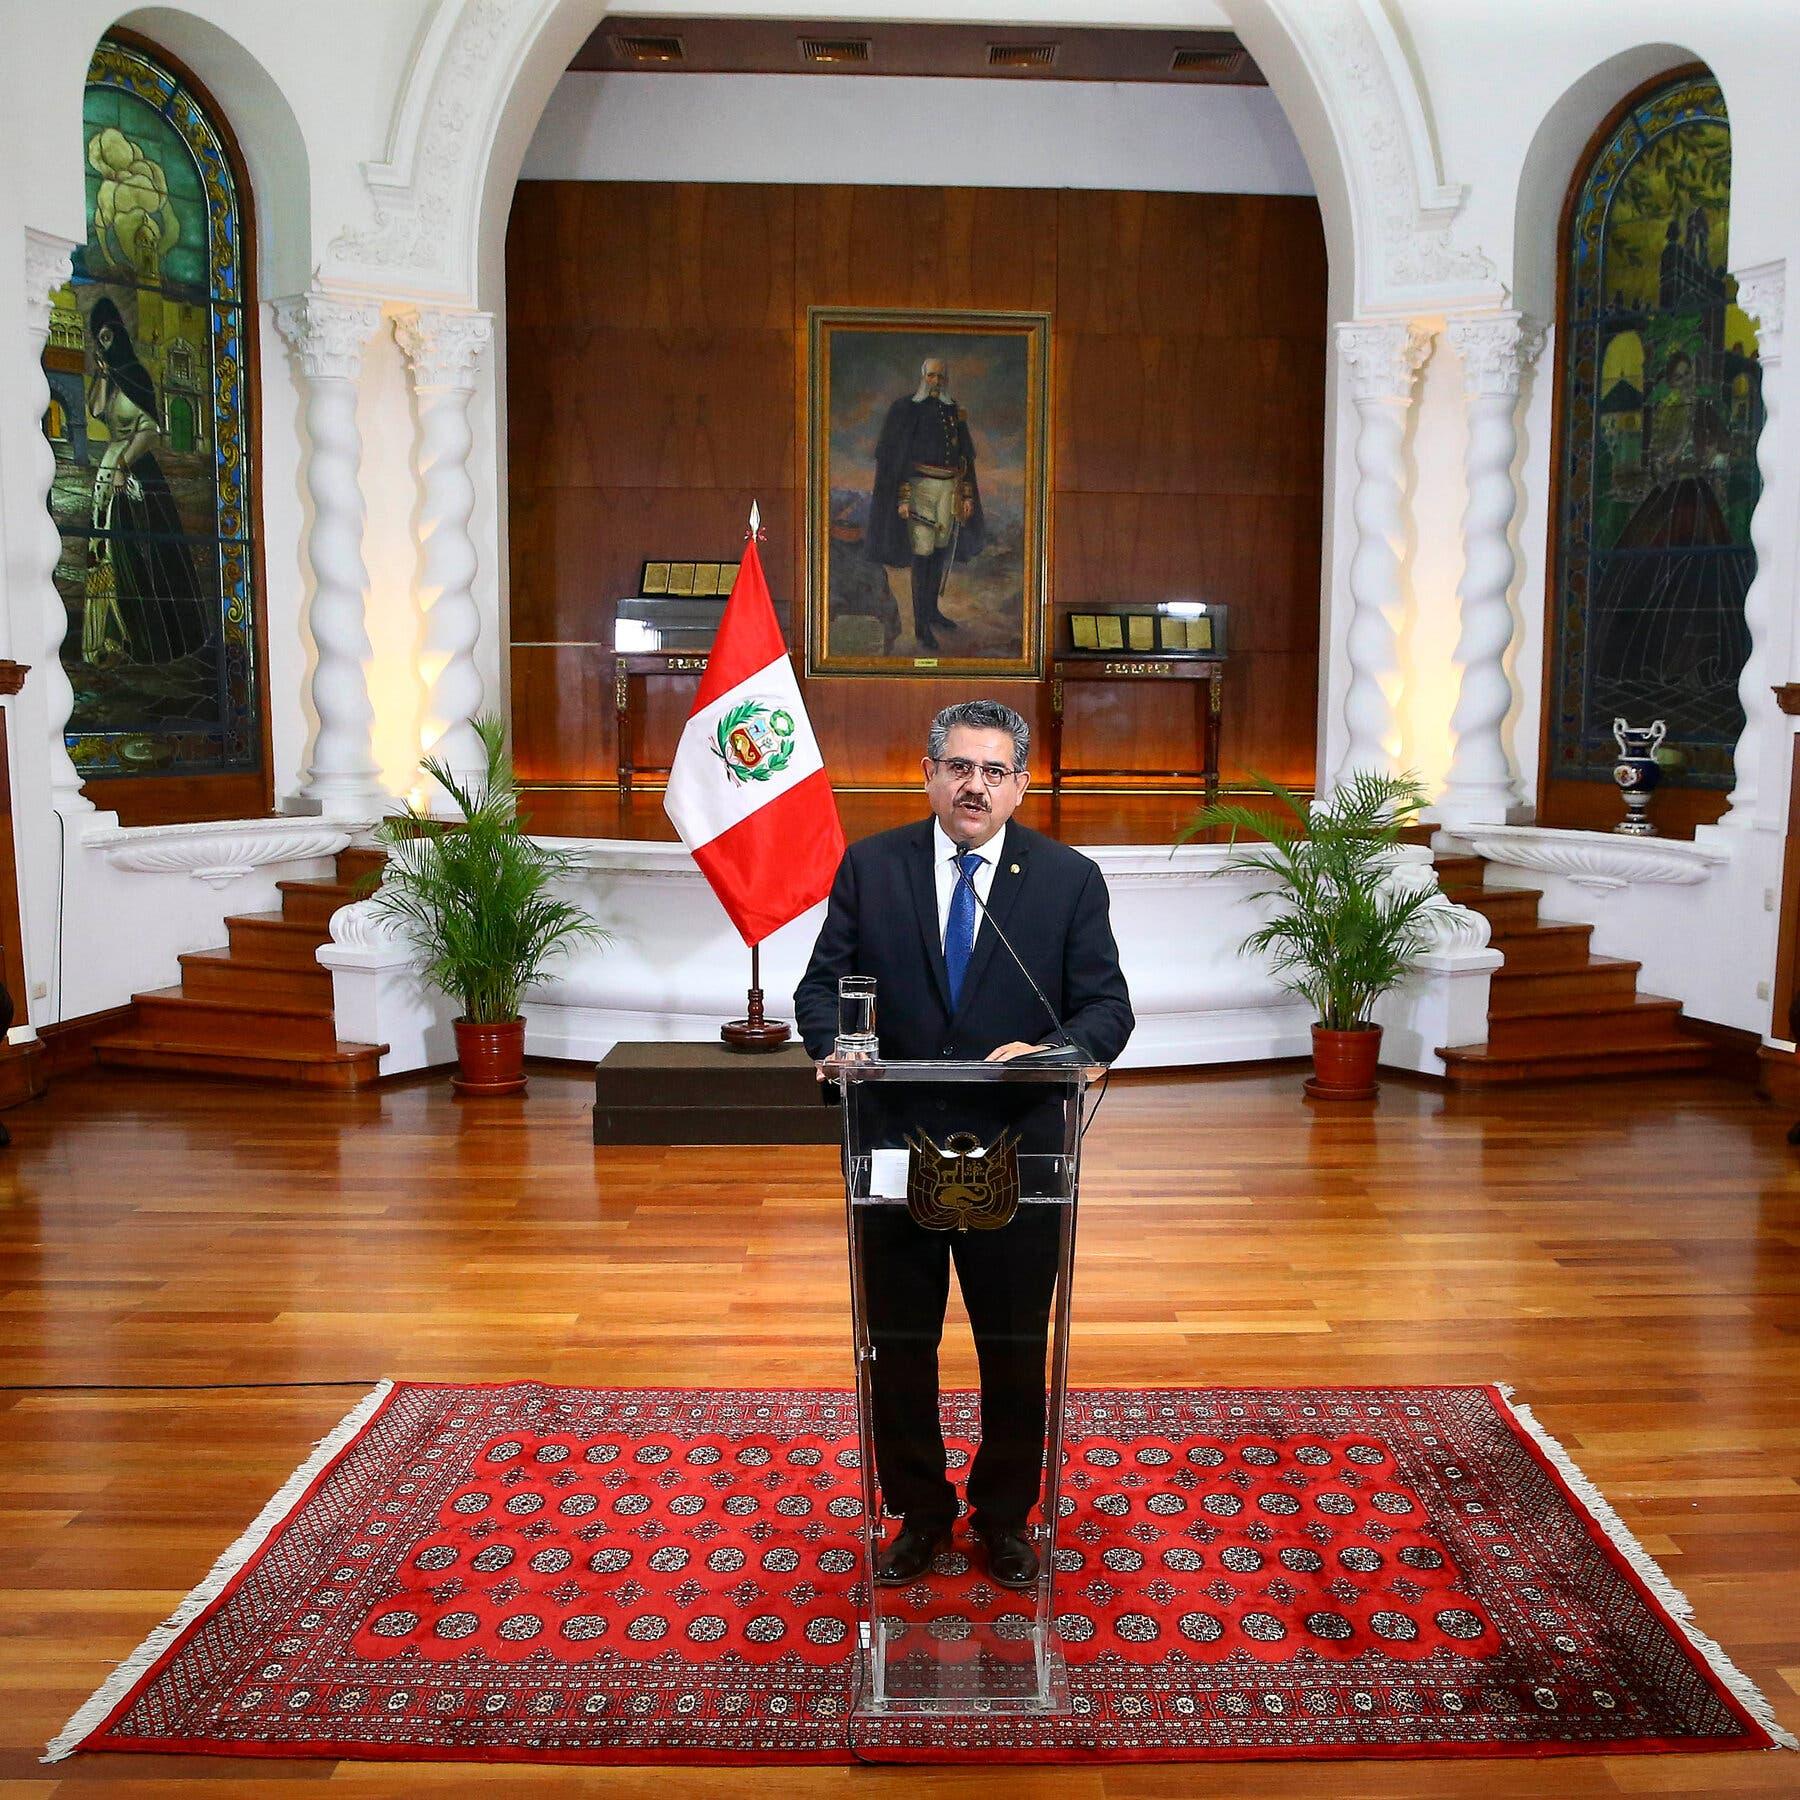 Peru interim president steps down after six days on the job